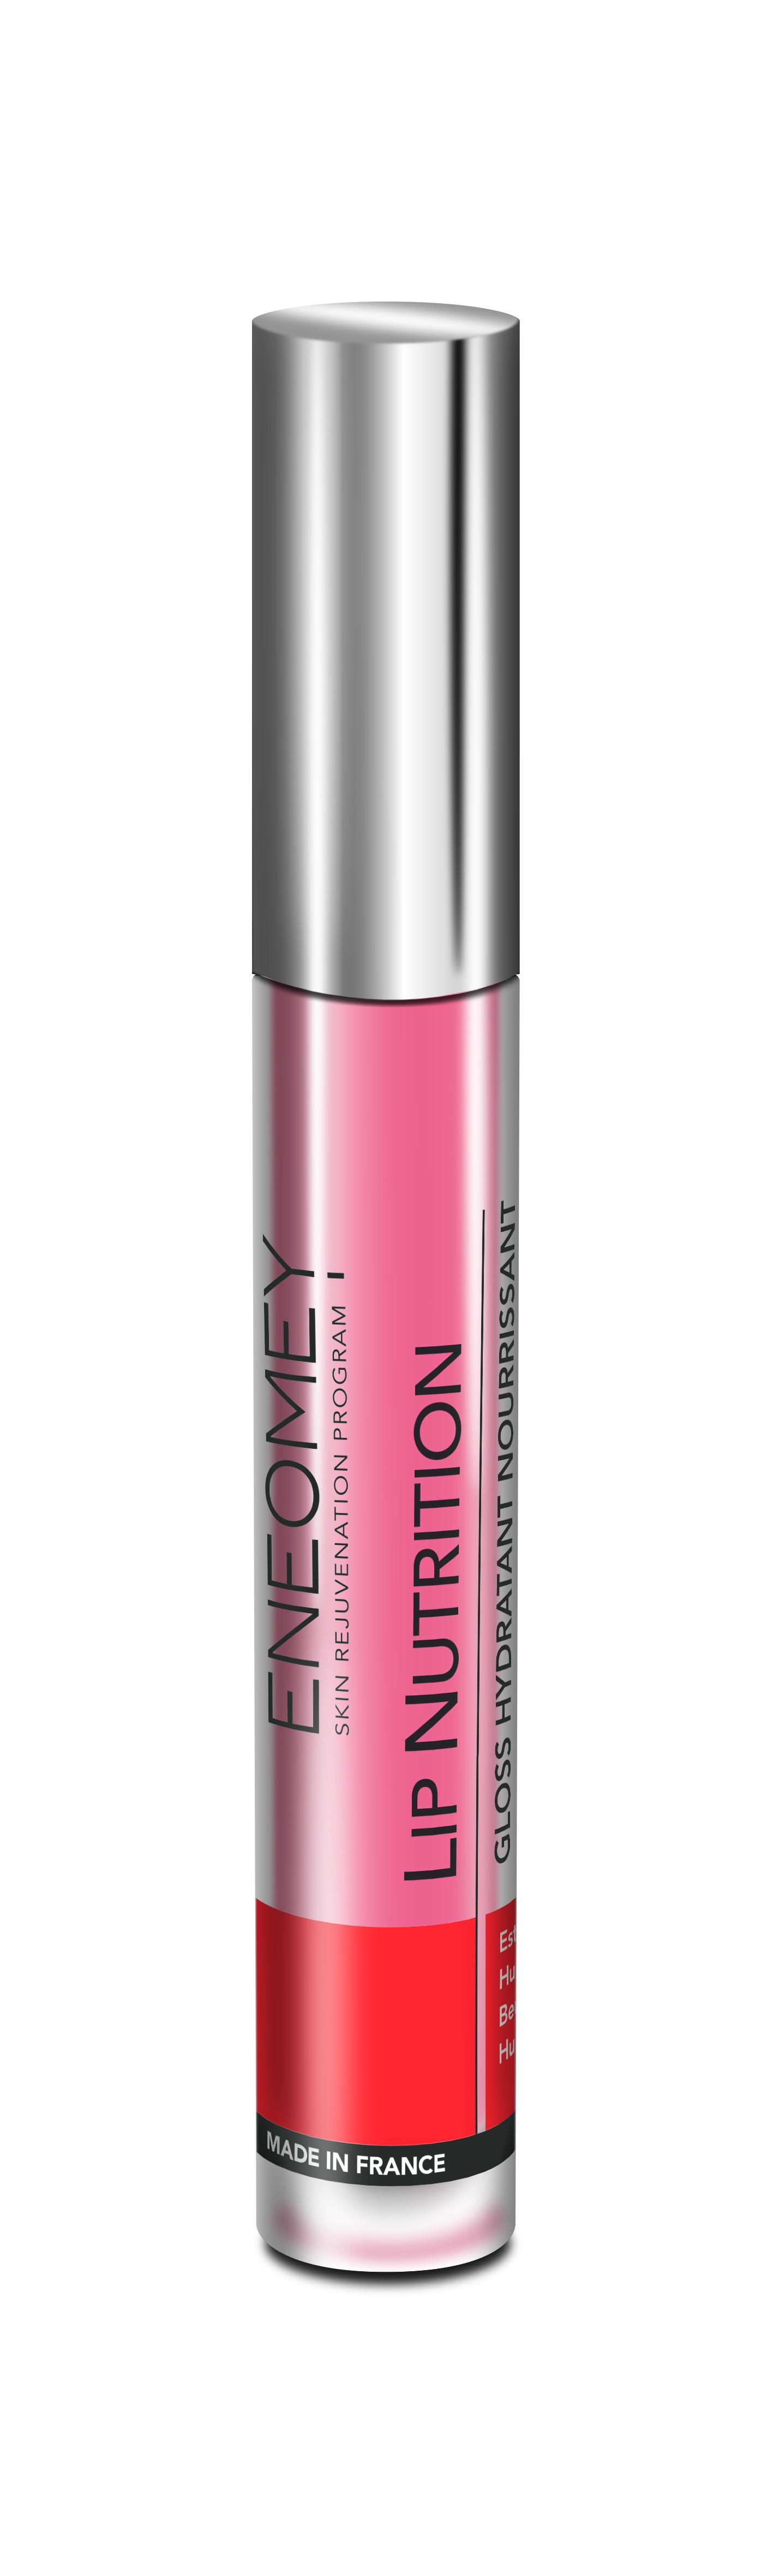 Lip Nutrition Lipgloss 4ml